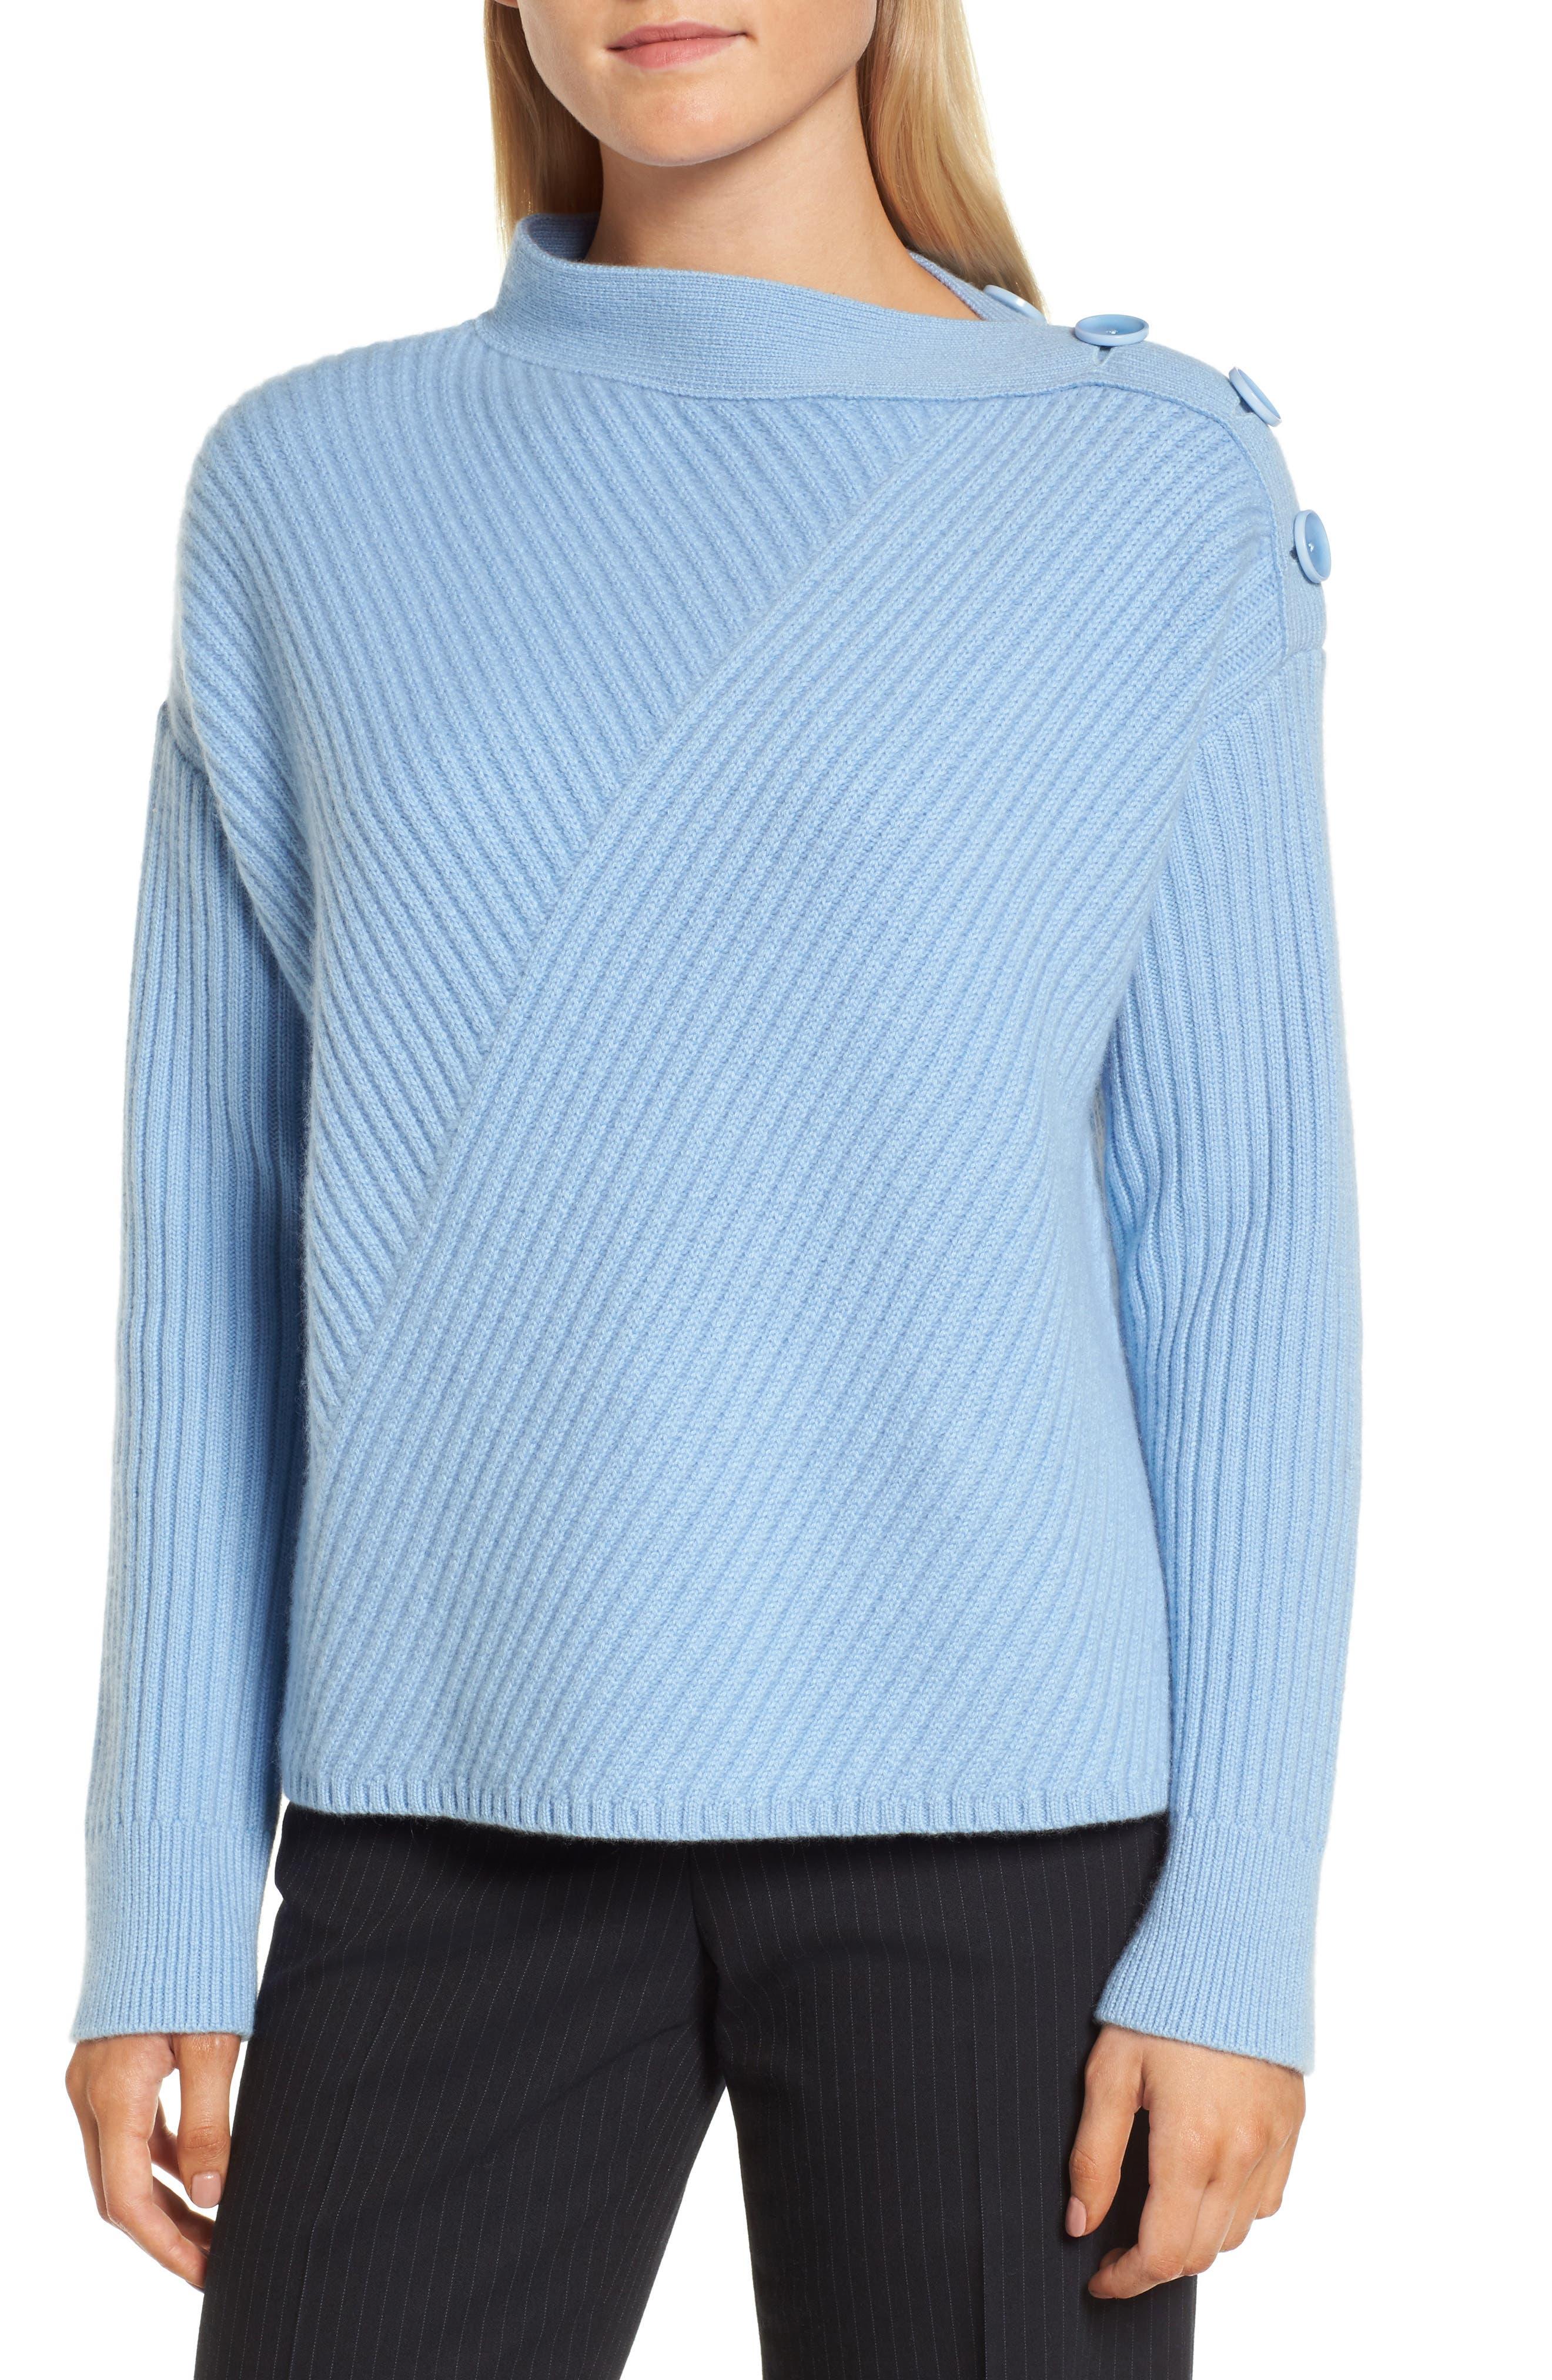 Alternate Image 1 Selected - Lewitt Bateau Neck Button Detail Cashmere Pullover